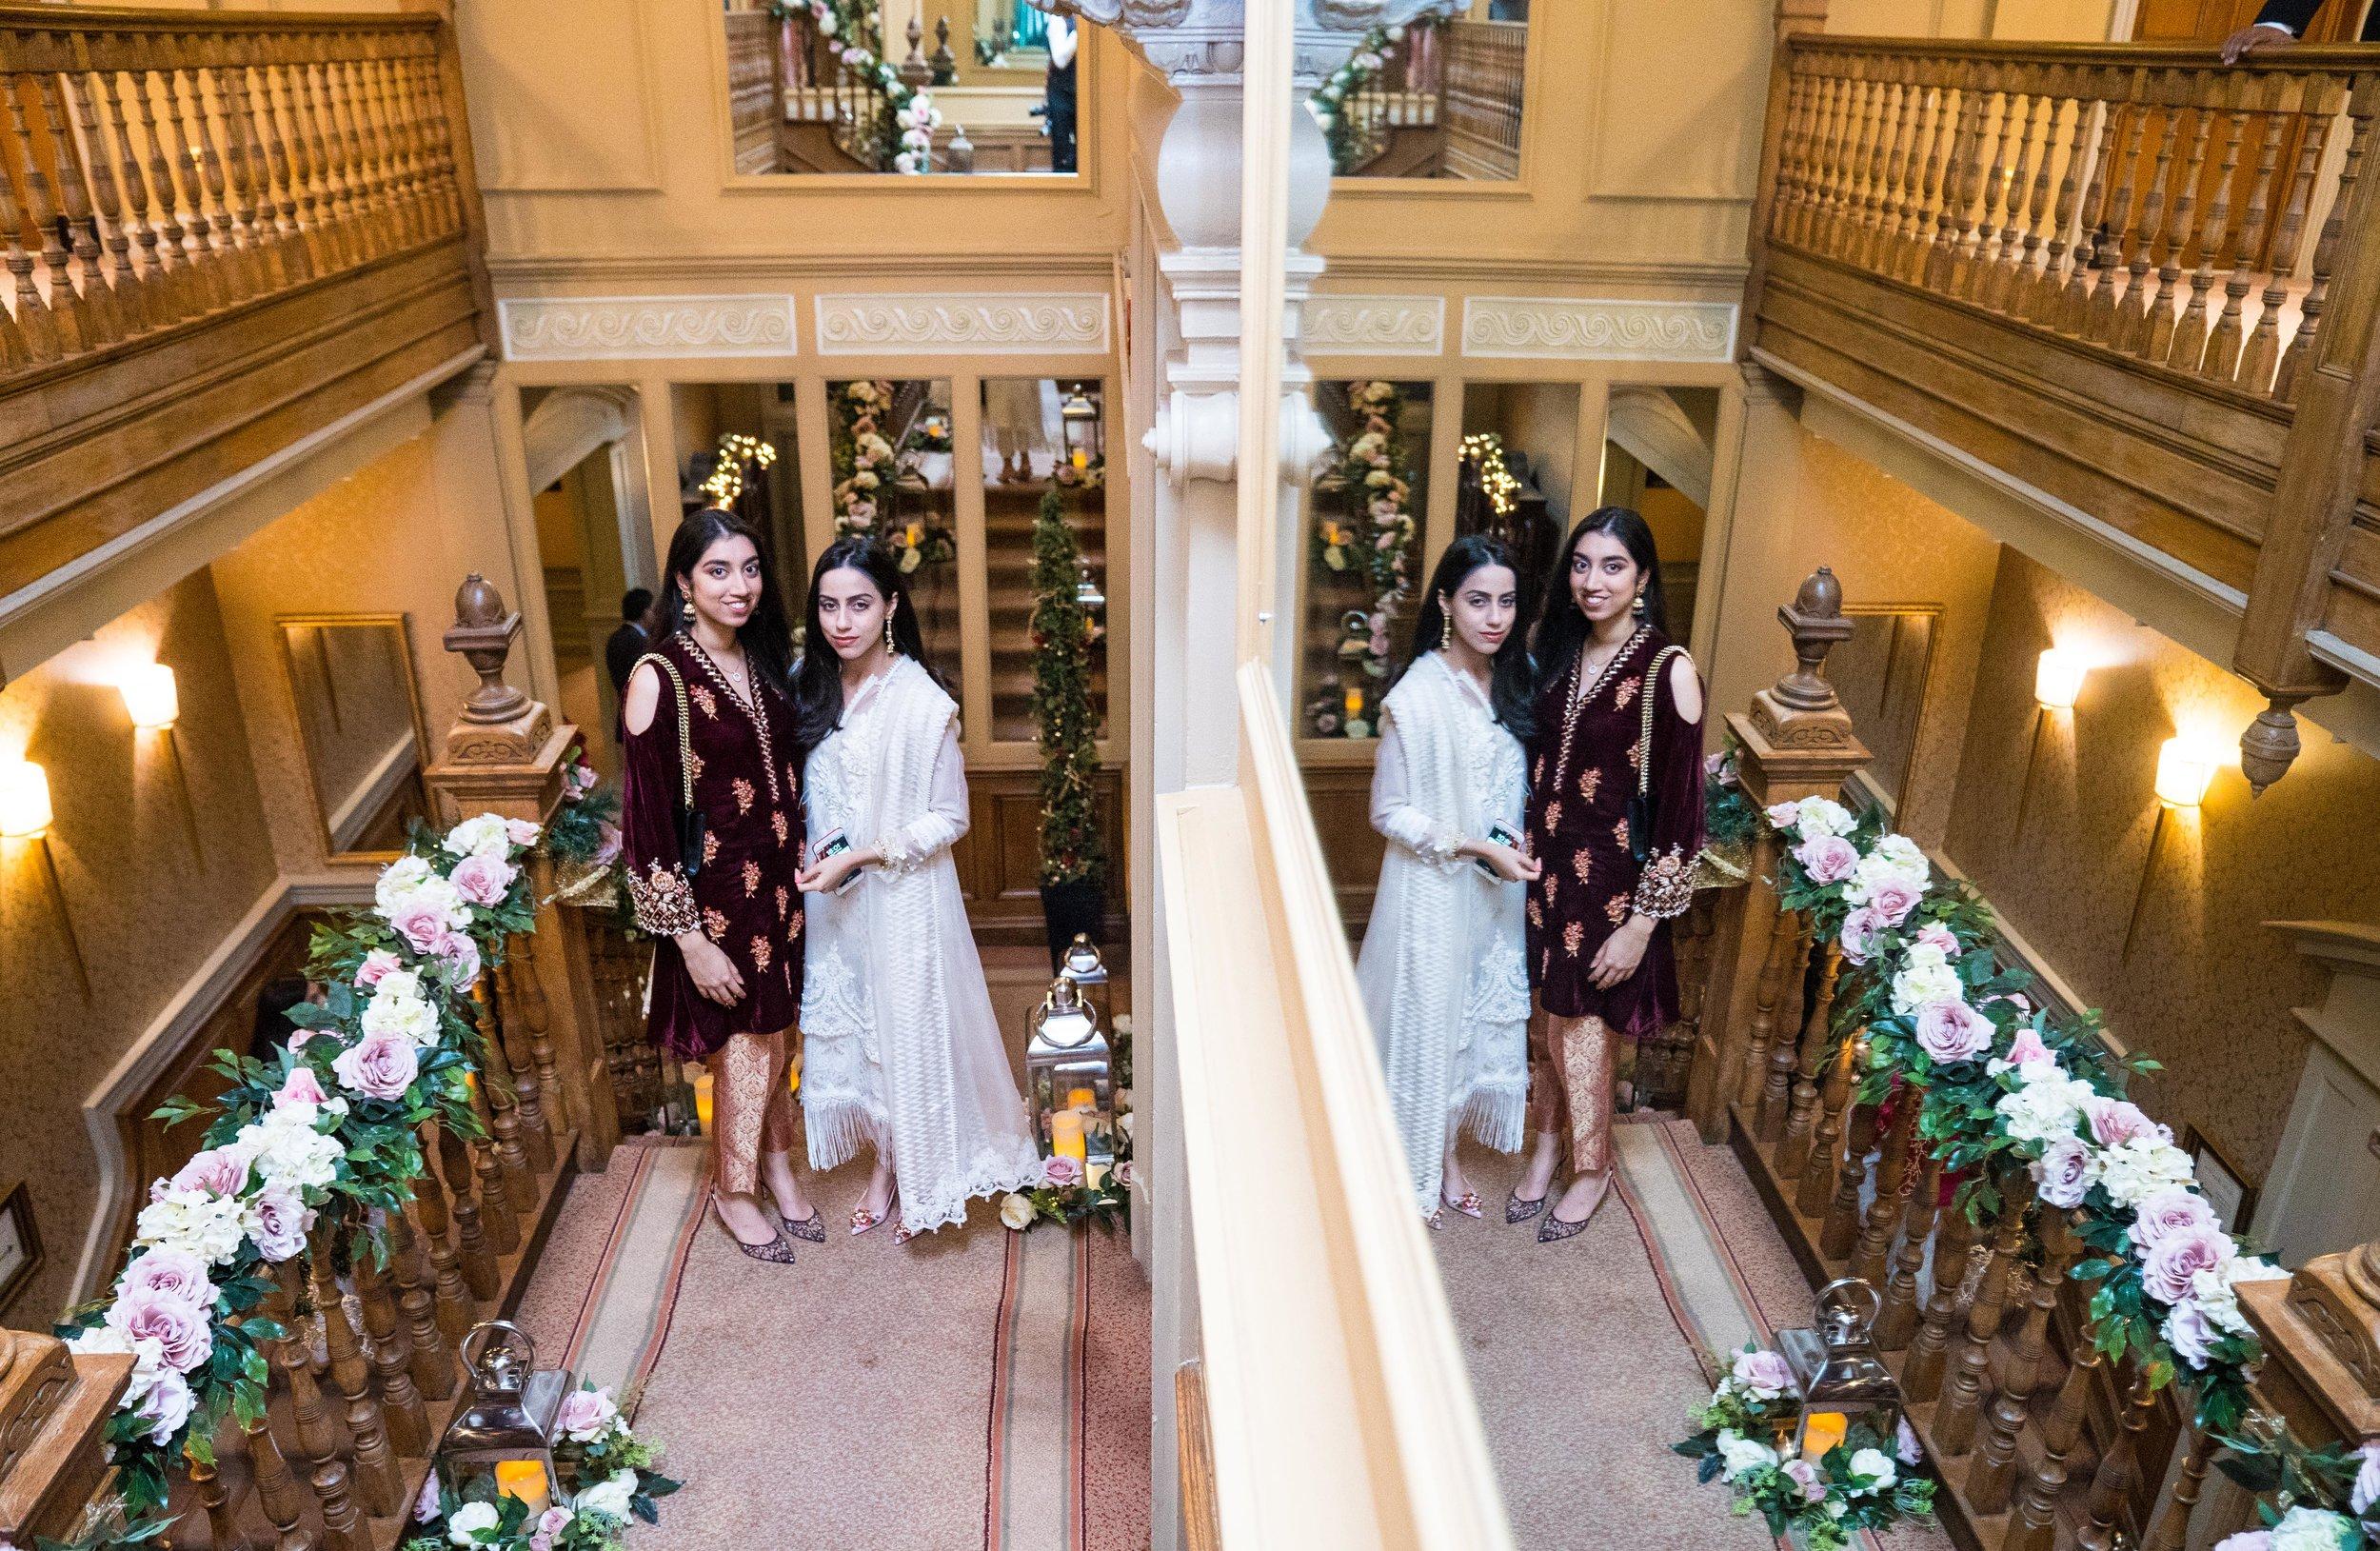 buckinghamshire-golf-club-winter-muslim-wedding-engagement-photography-videography-08